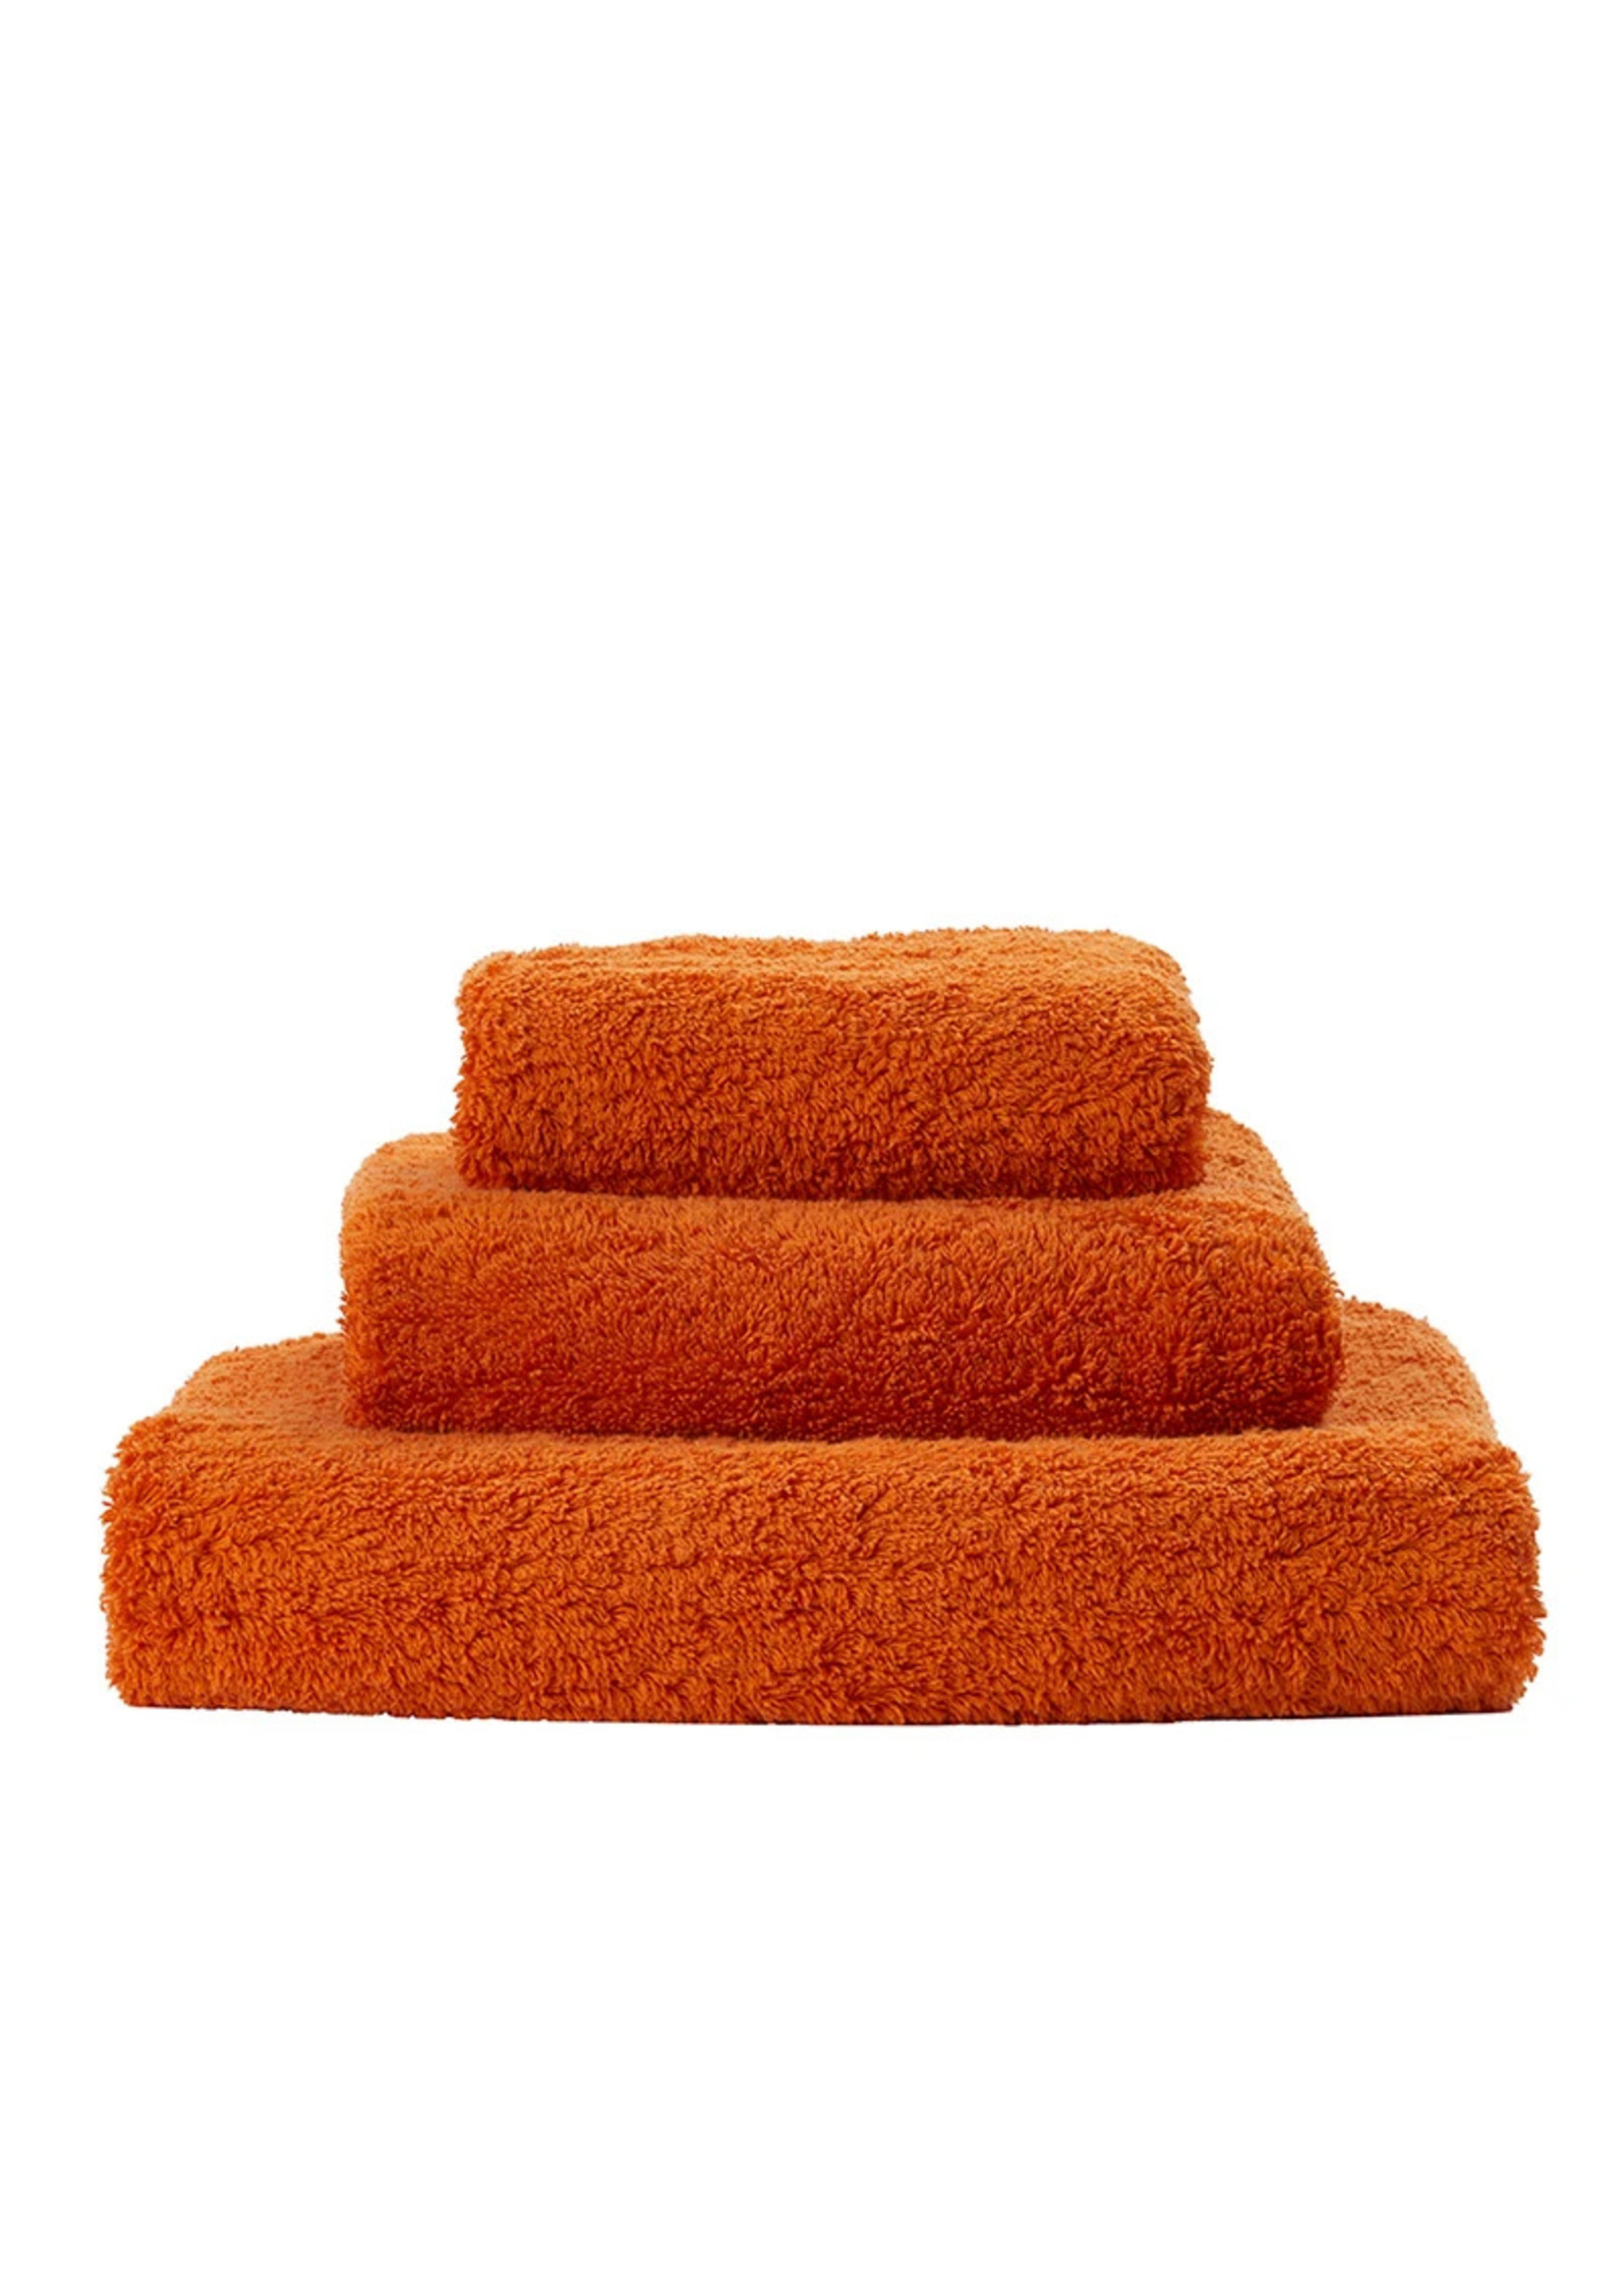 Abyss & Habidecor Super Pile Mandarin Towels